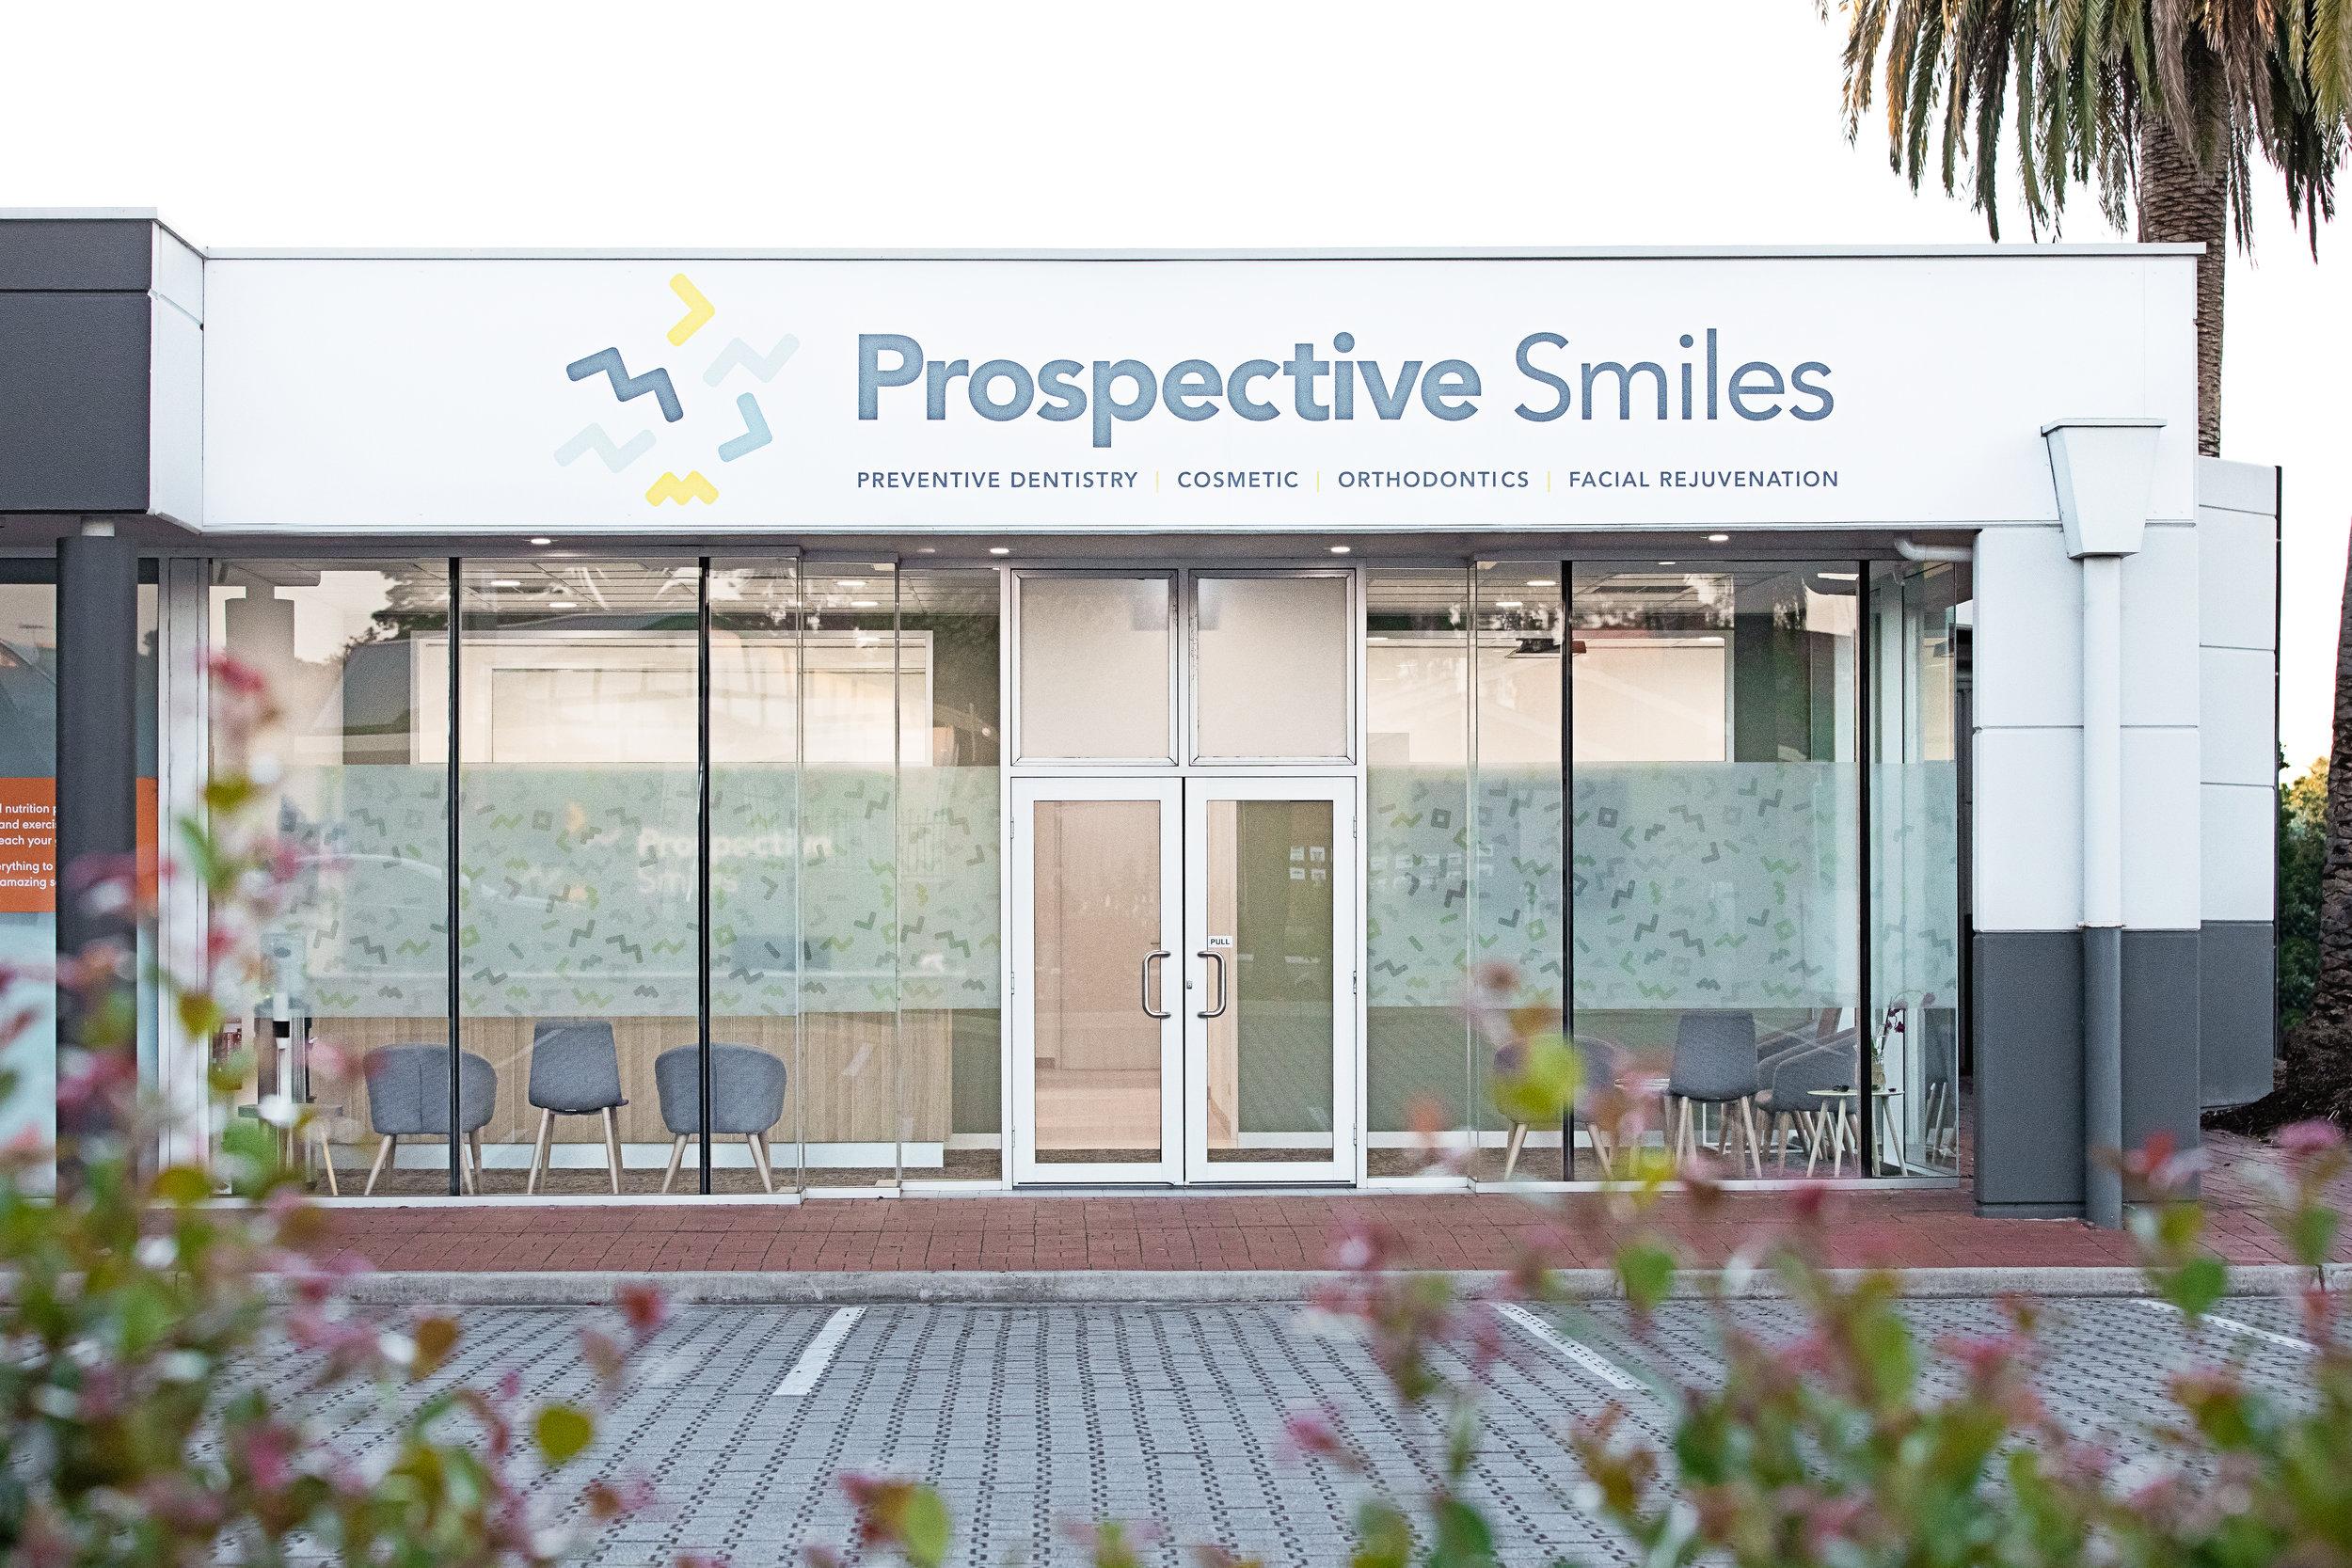 Prospective_Smiles-6.jpg